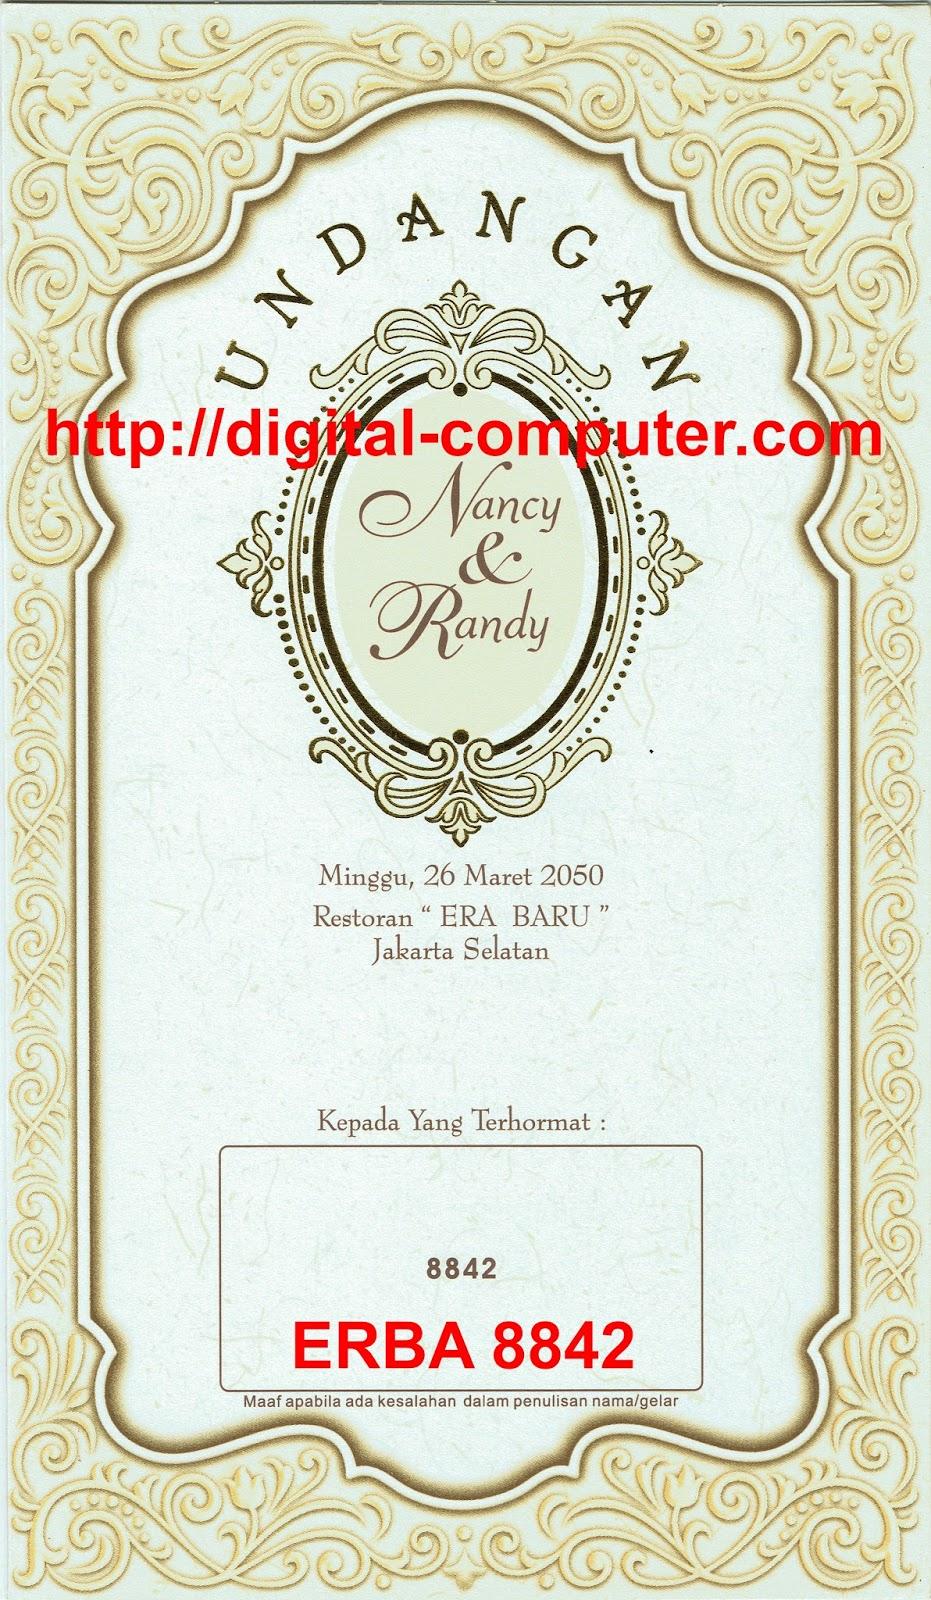 Undangan Softcover ERBA 8842